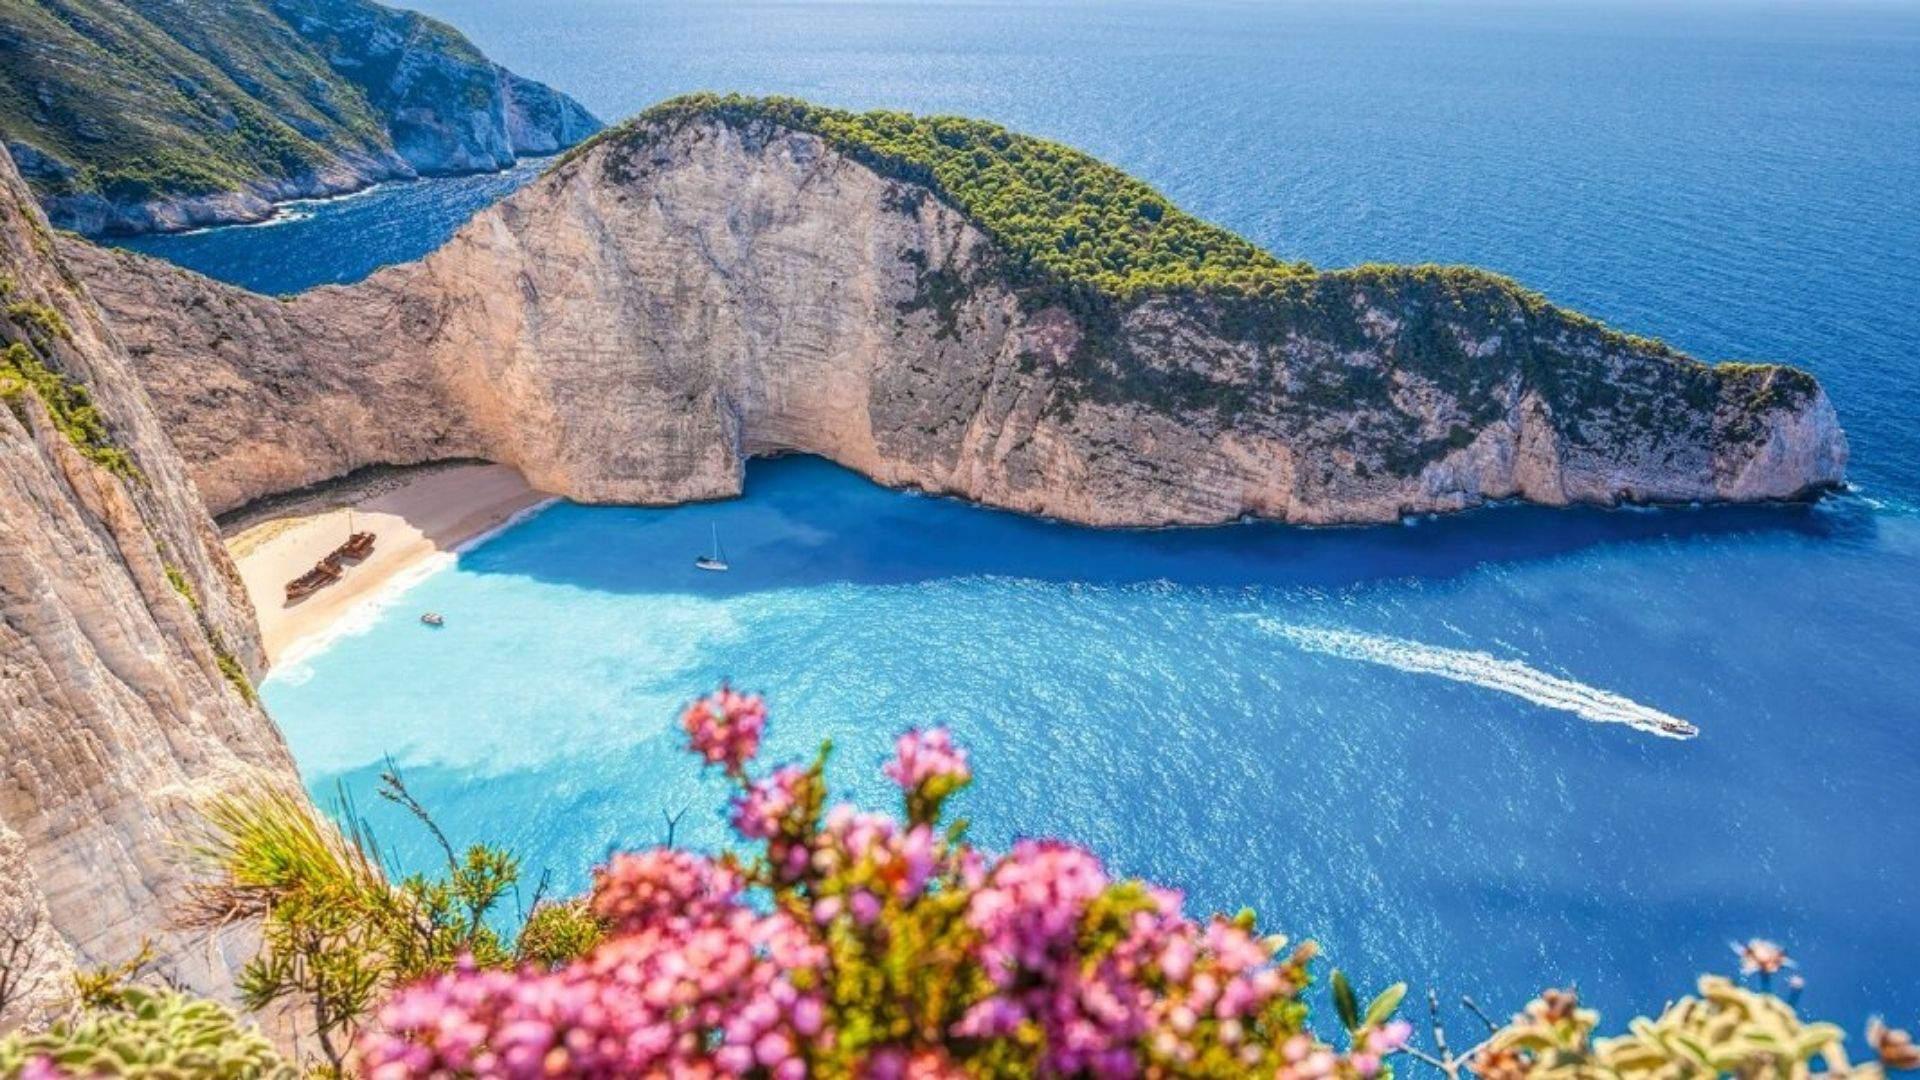 Zakinto sala garsėja nuostabiomis uolomis